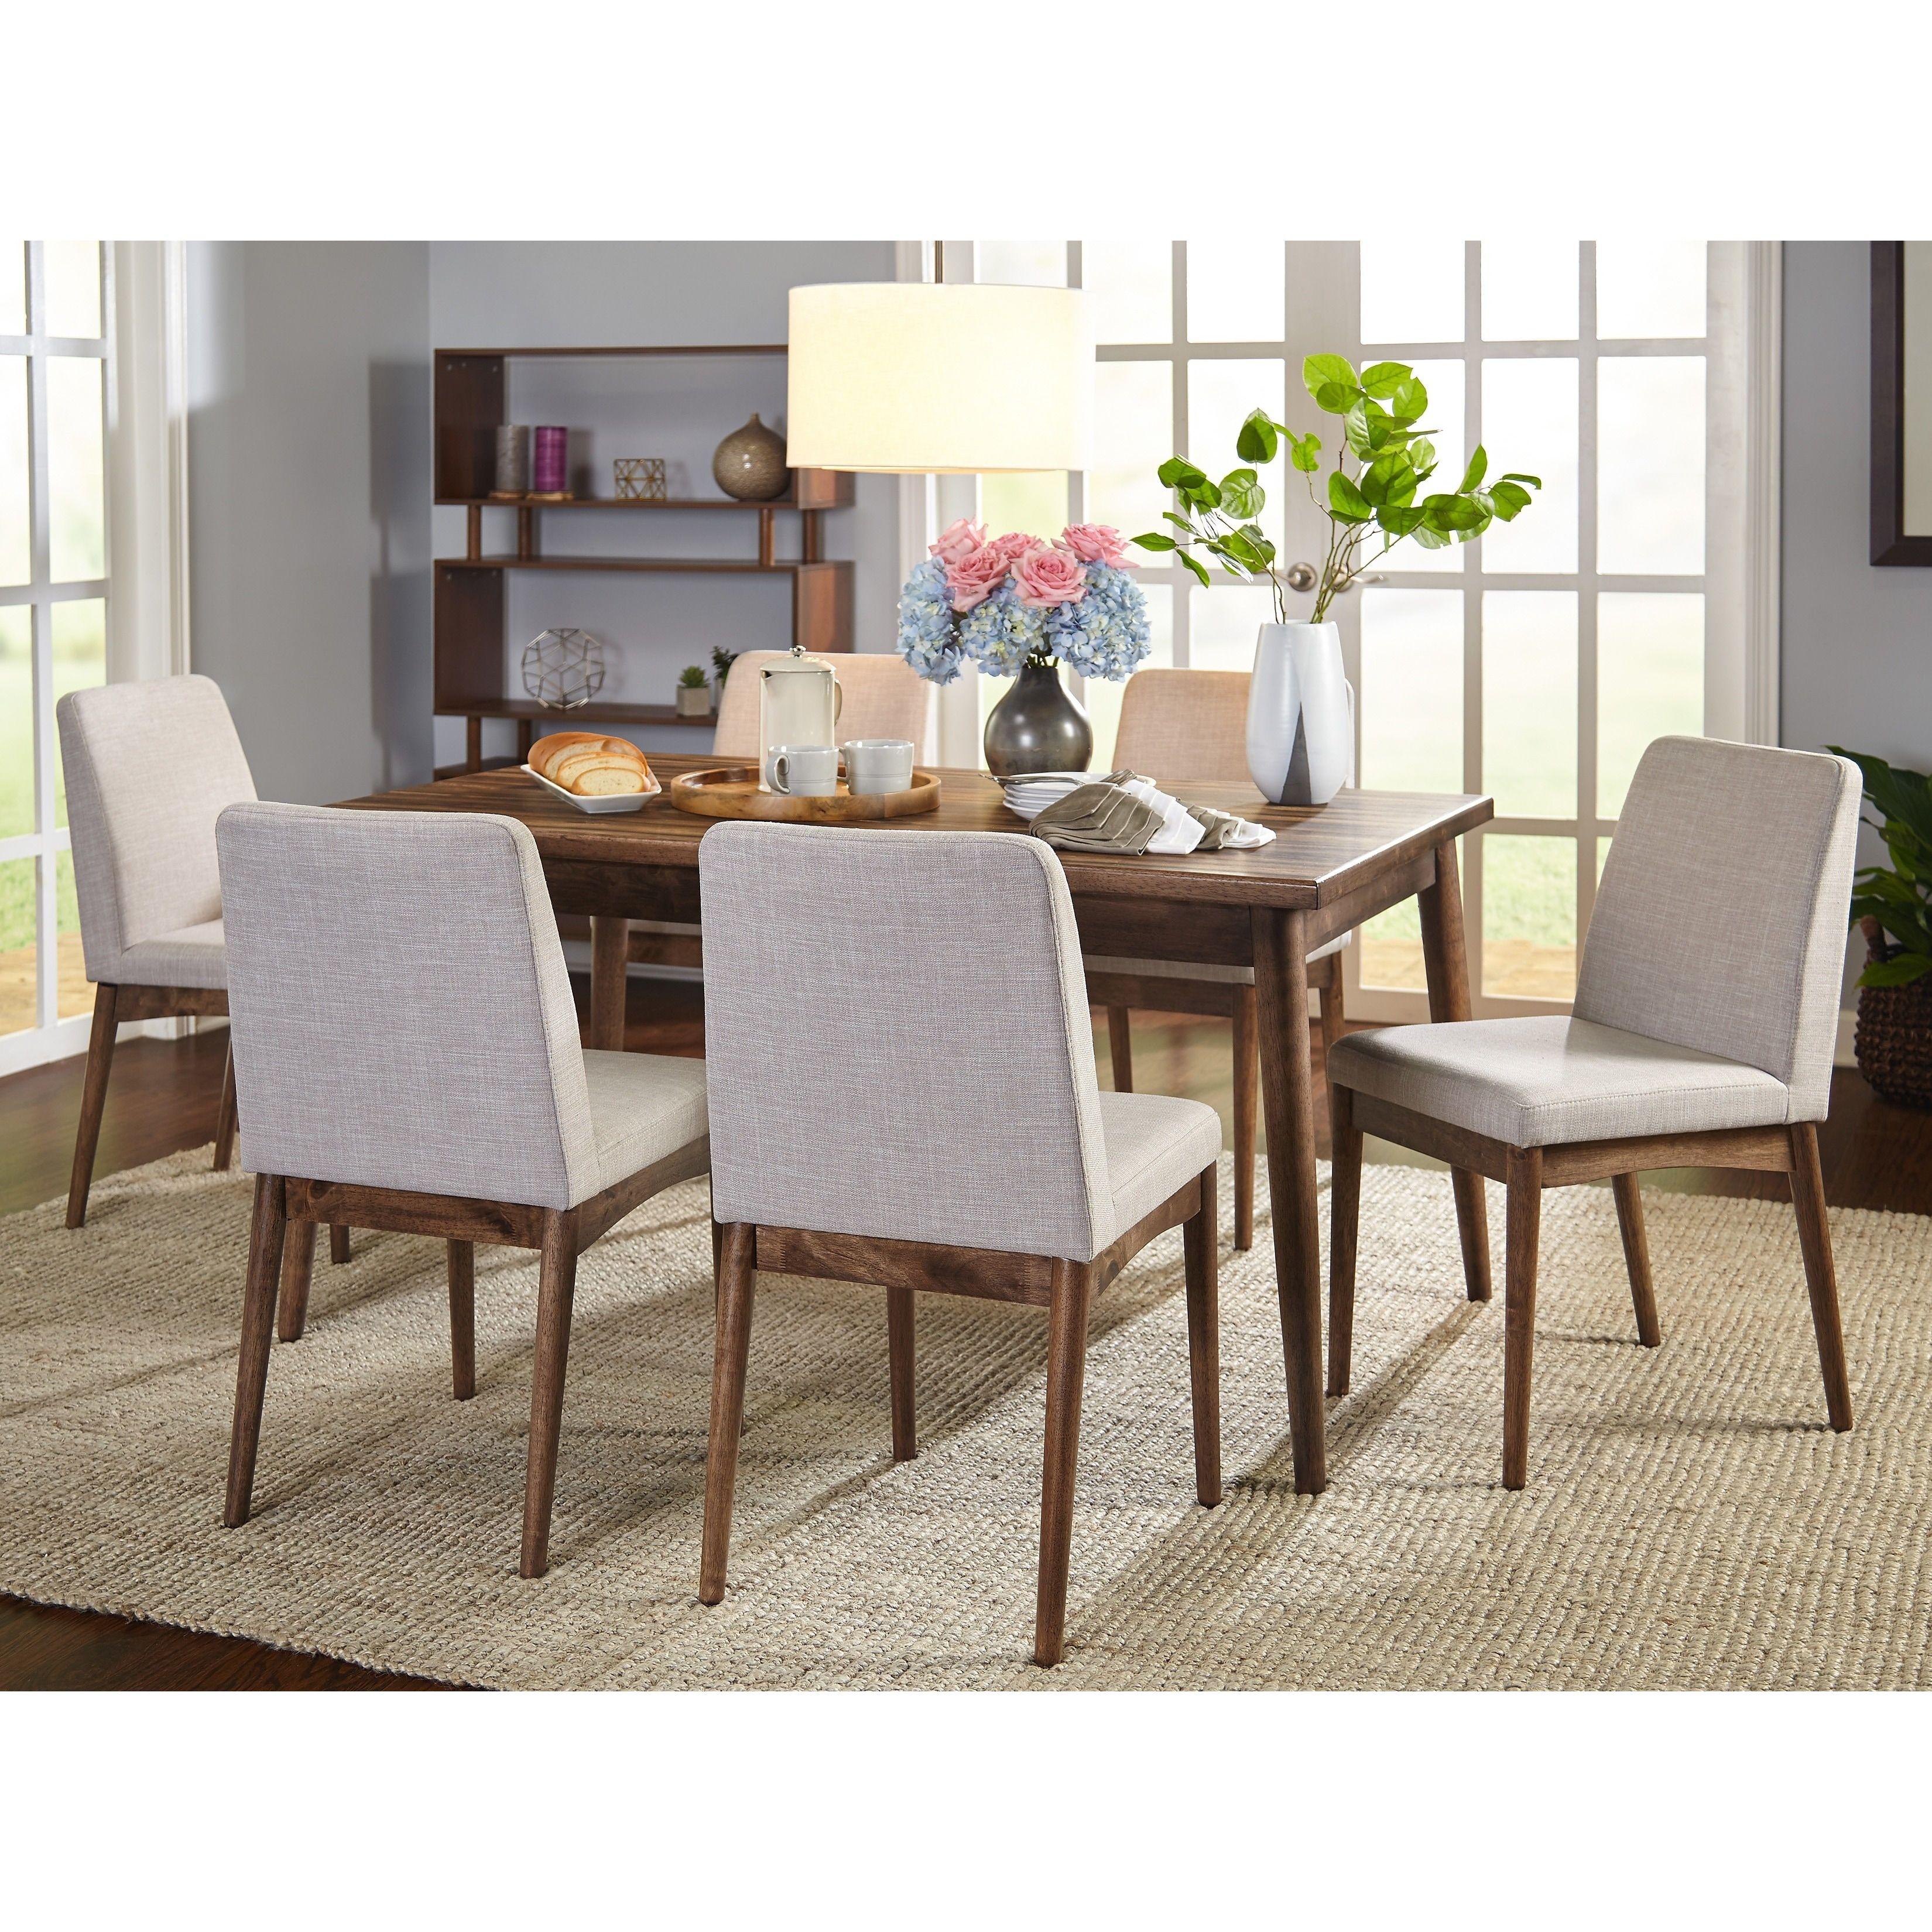 Home Mid Century Dining Set Dining Room Sets Mid Century